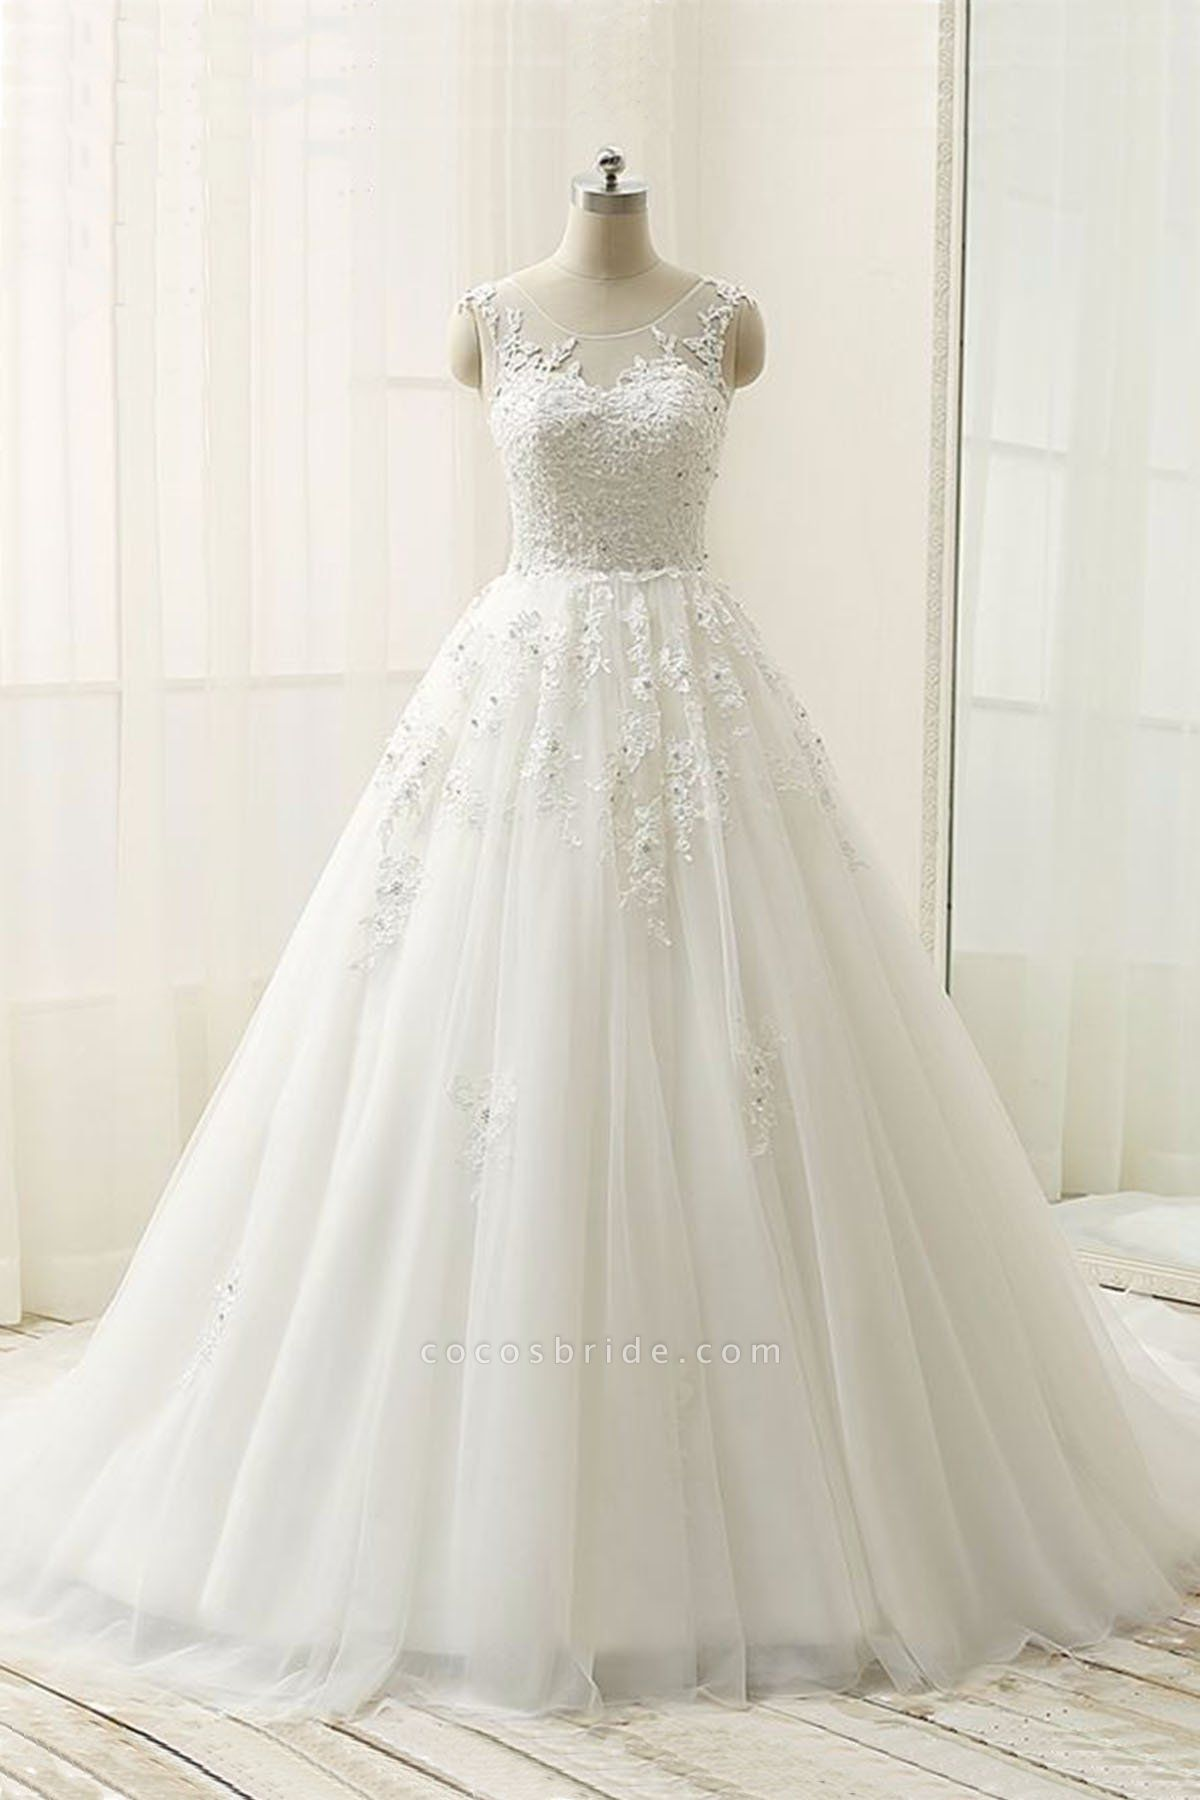 Elegant White Tulle Customize A-Line Long Wedding Dress